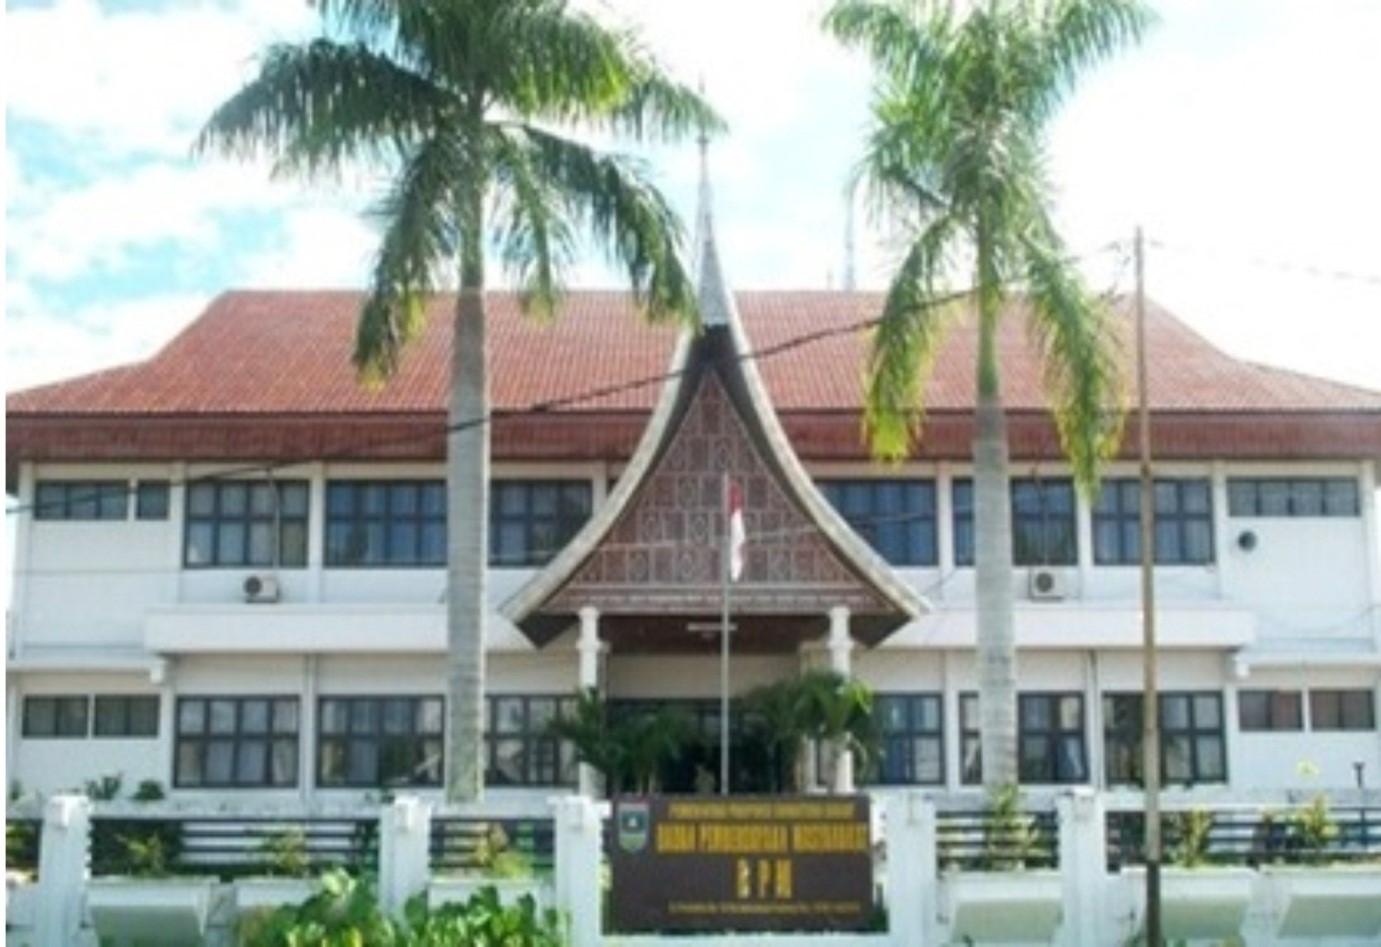 UEM-SP/KMN Berprestasi Tingkat Provinsi Sumatera Barat Tahun 2016